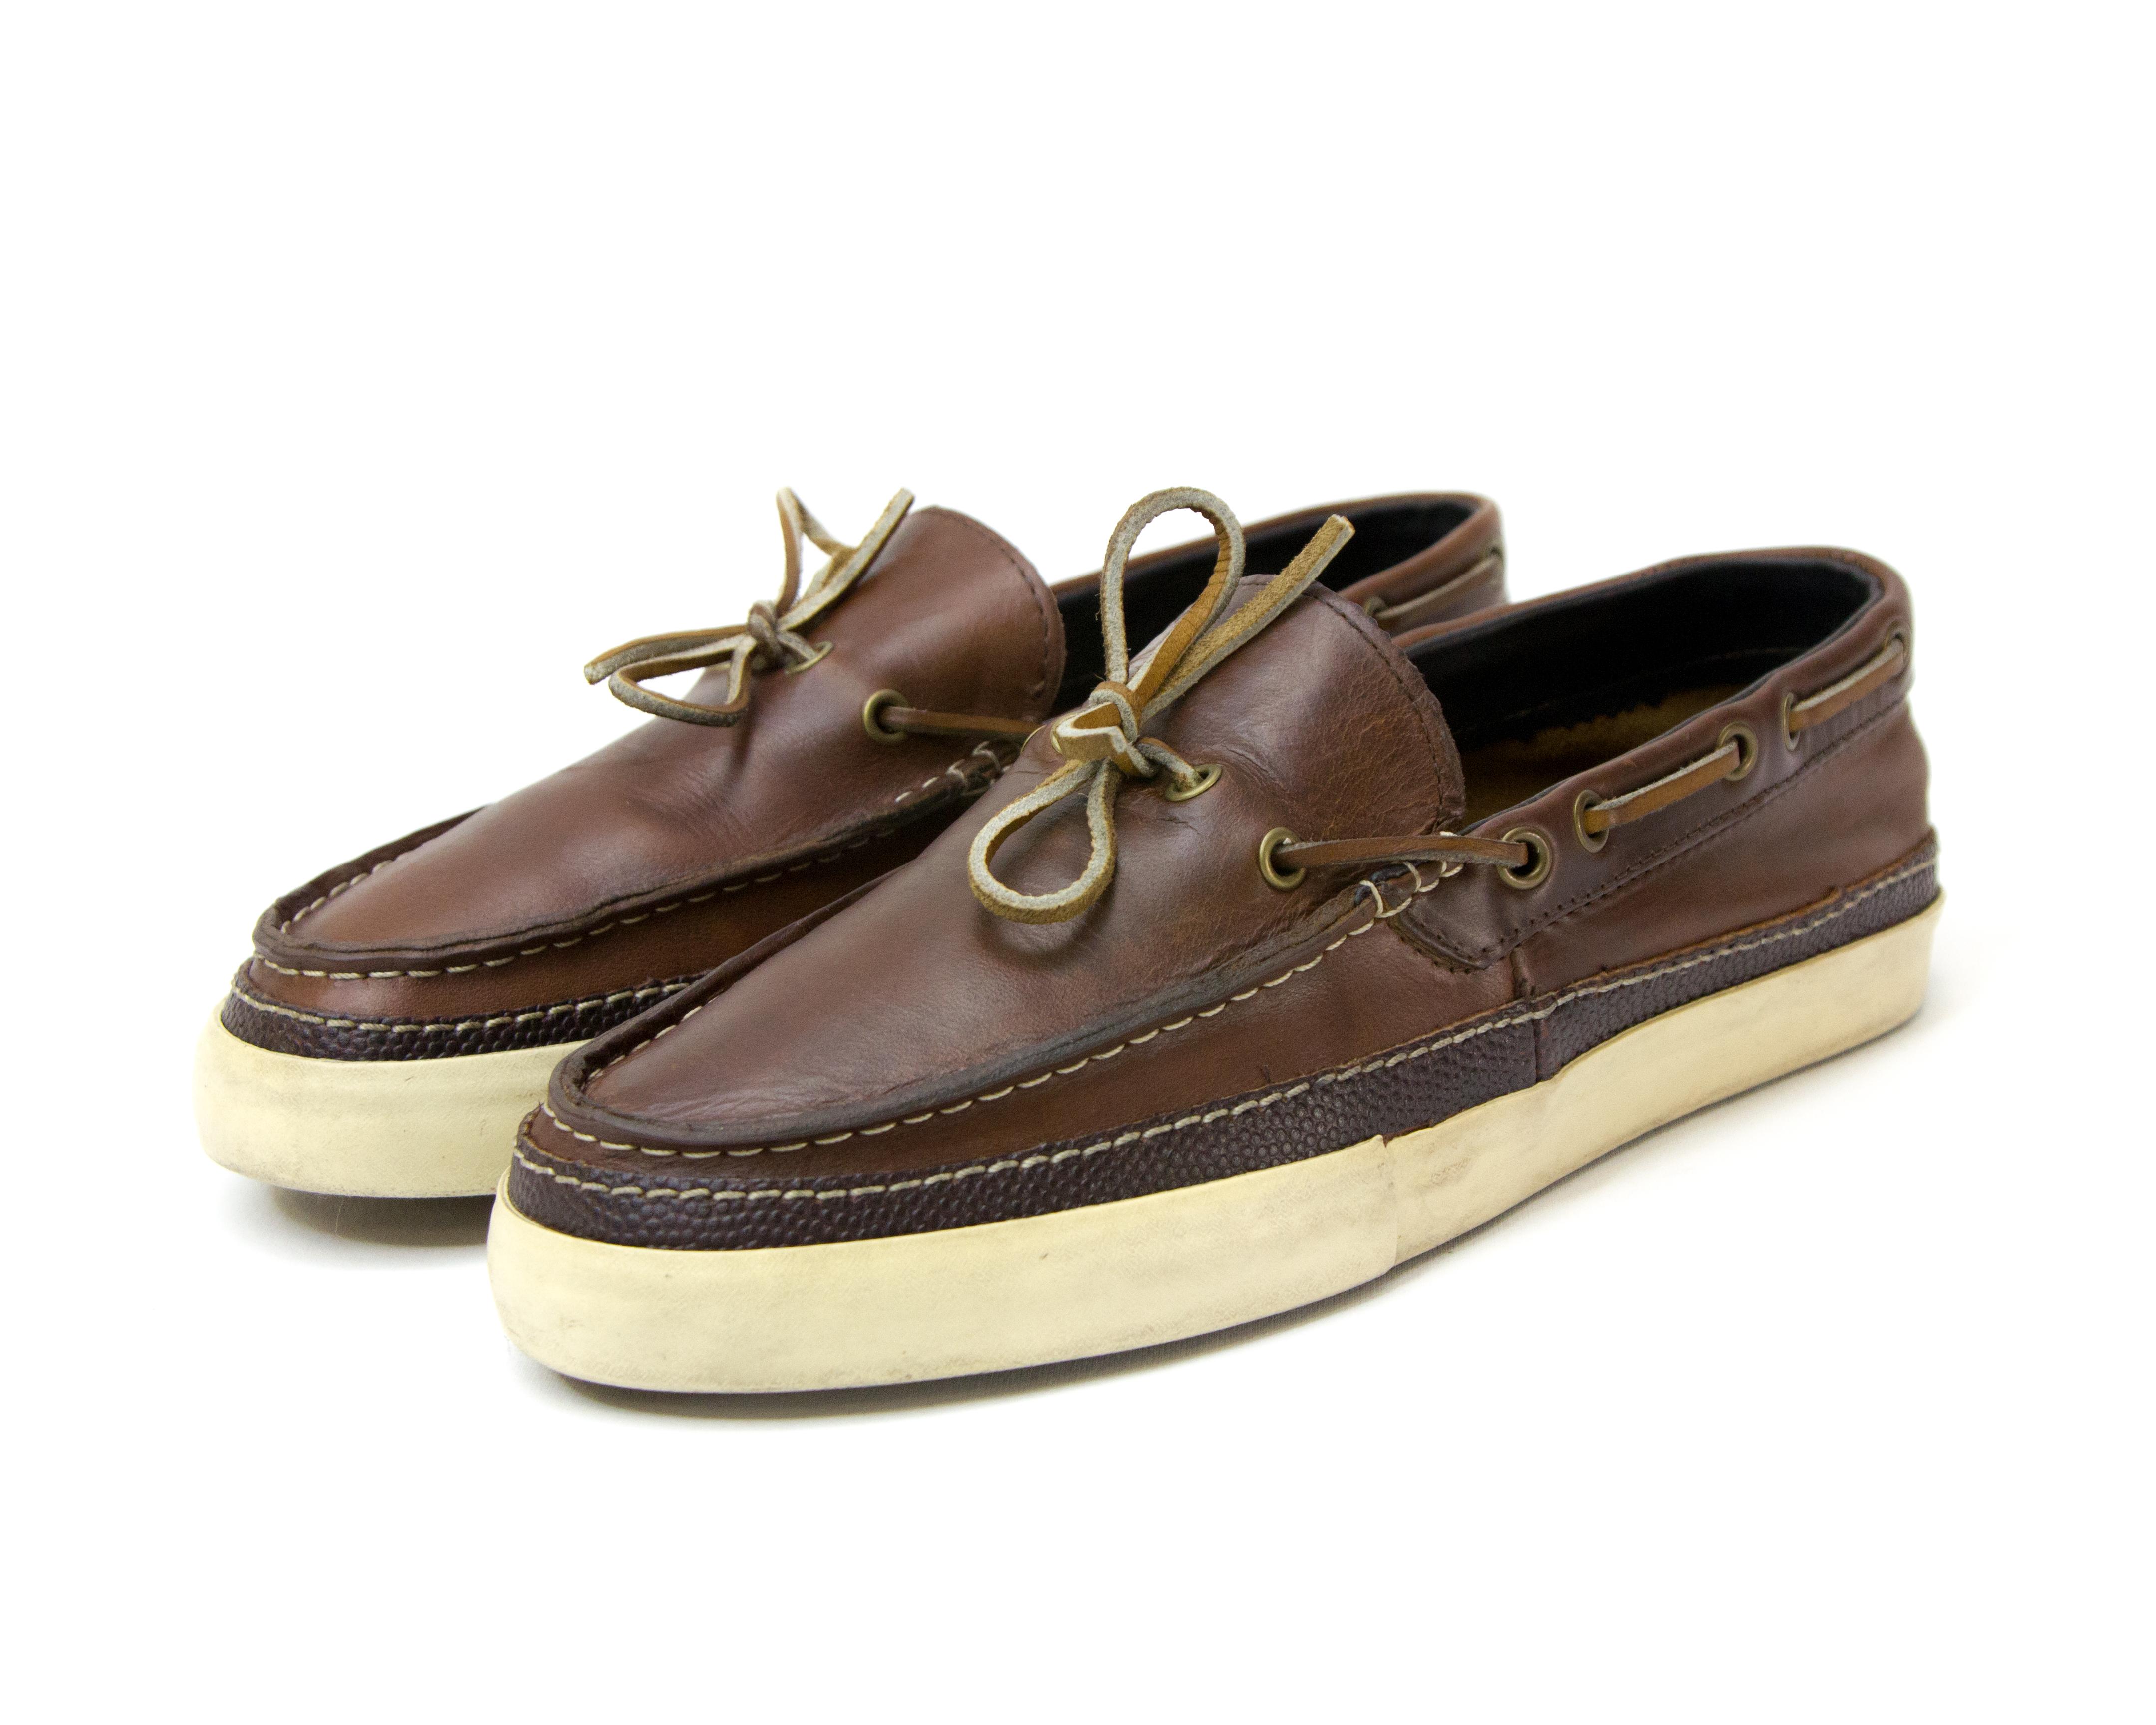 6a3606bbdb Vans 🔥FINAL DROP🔥 Vans Vault X Horween Leather Boat Shoe Piragua LX Size  9.5 - Slip Ons for Sale - Grailed